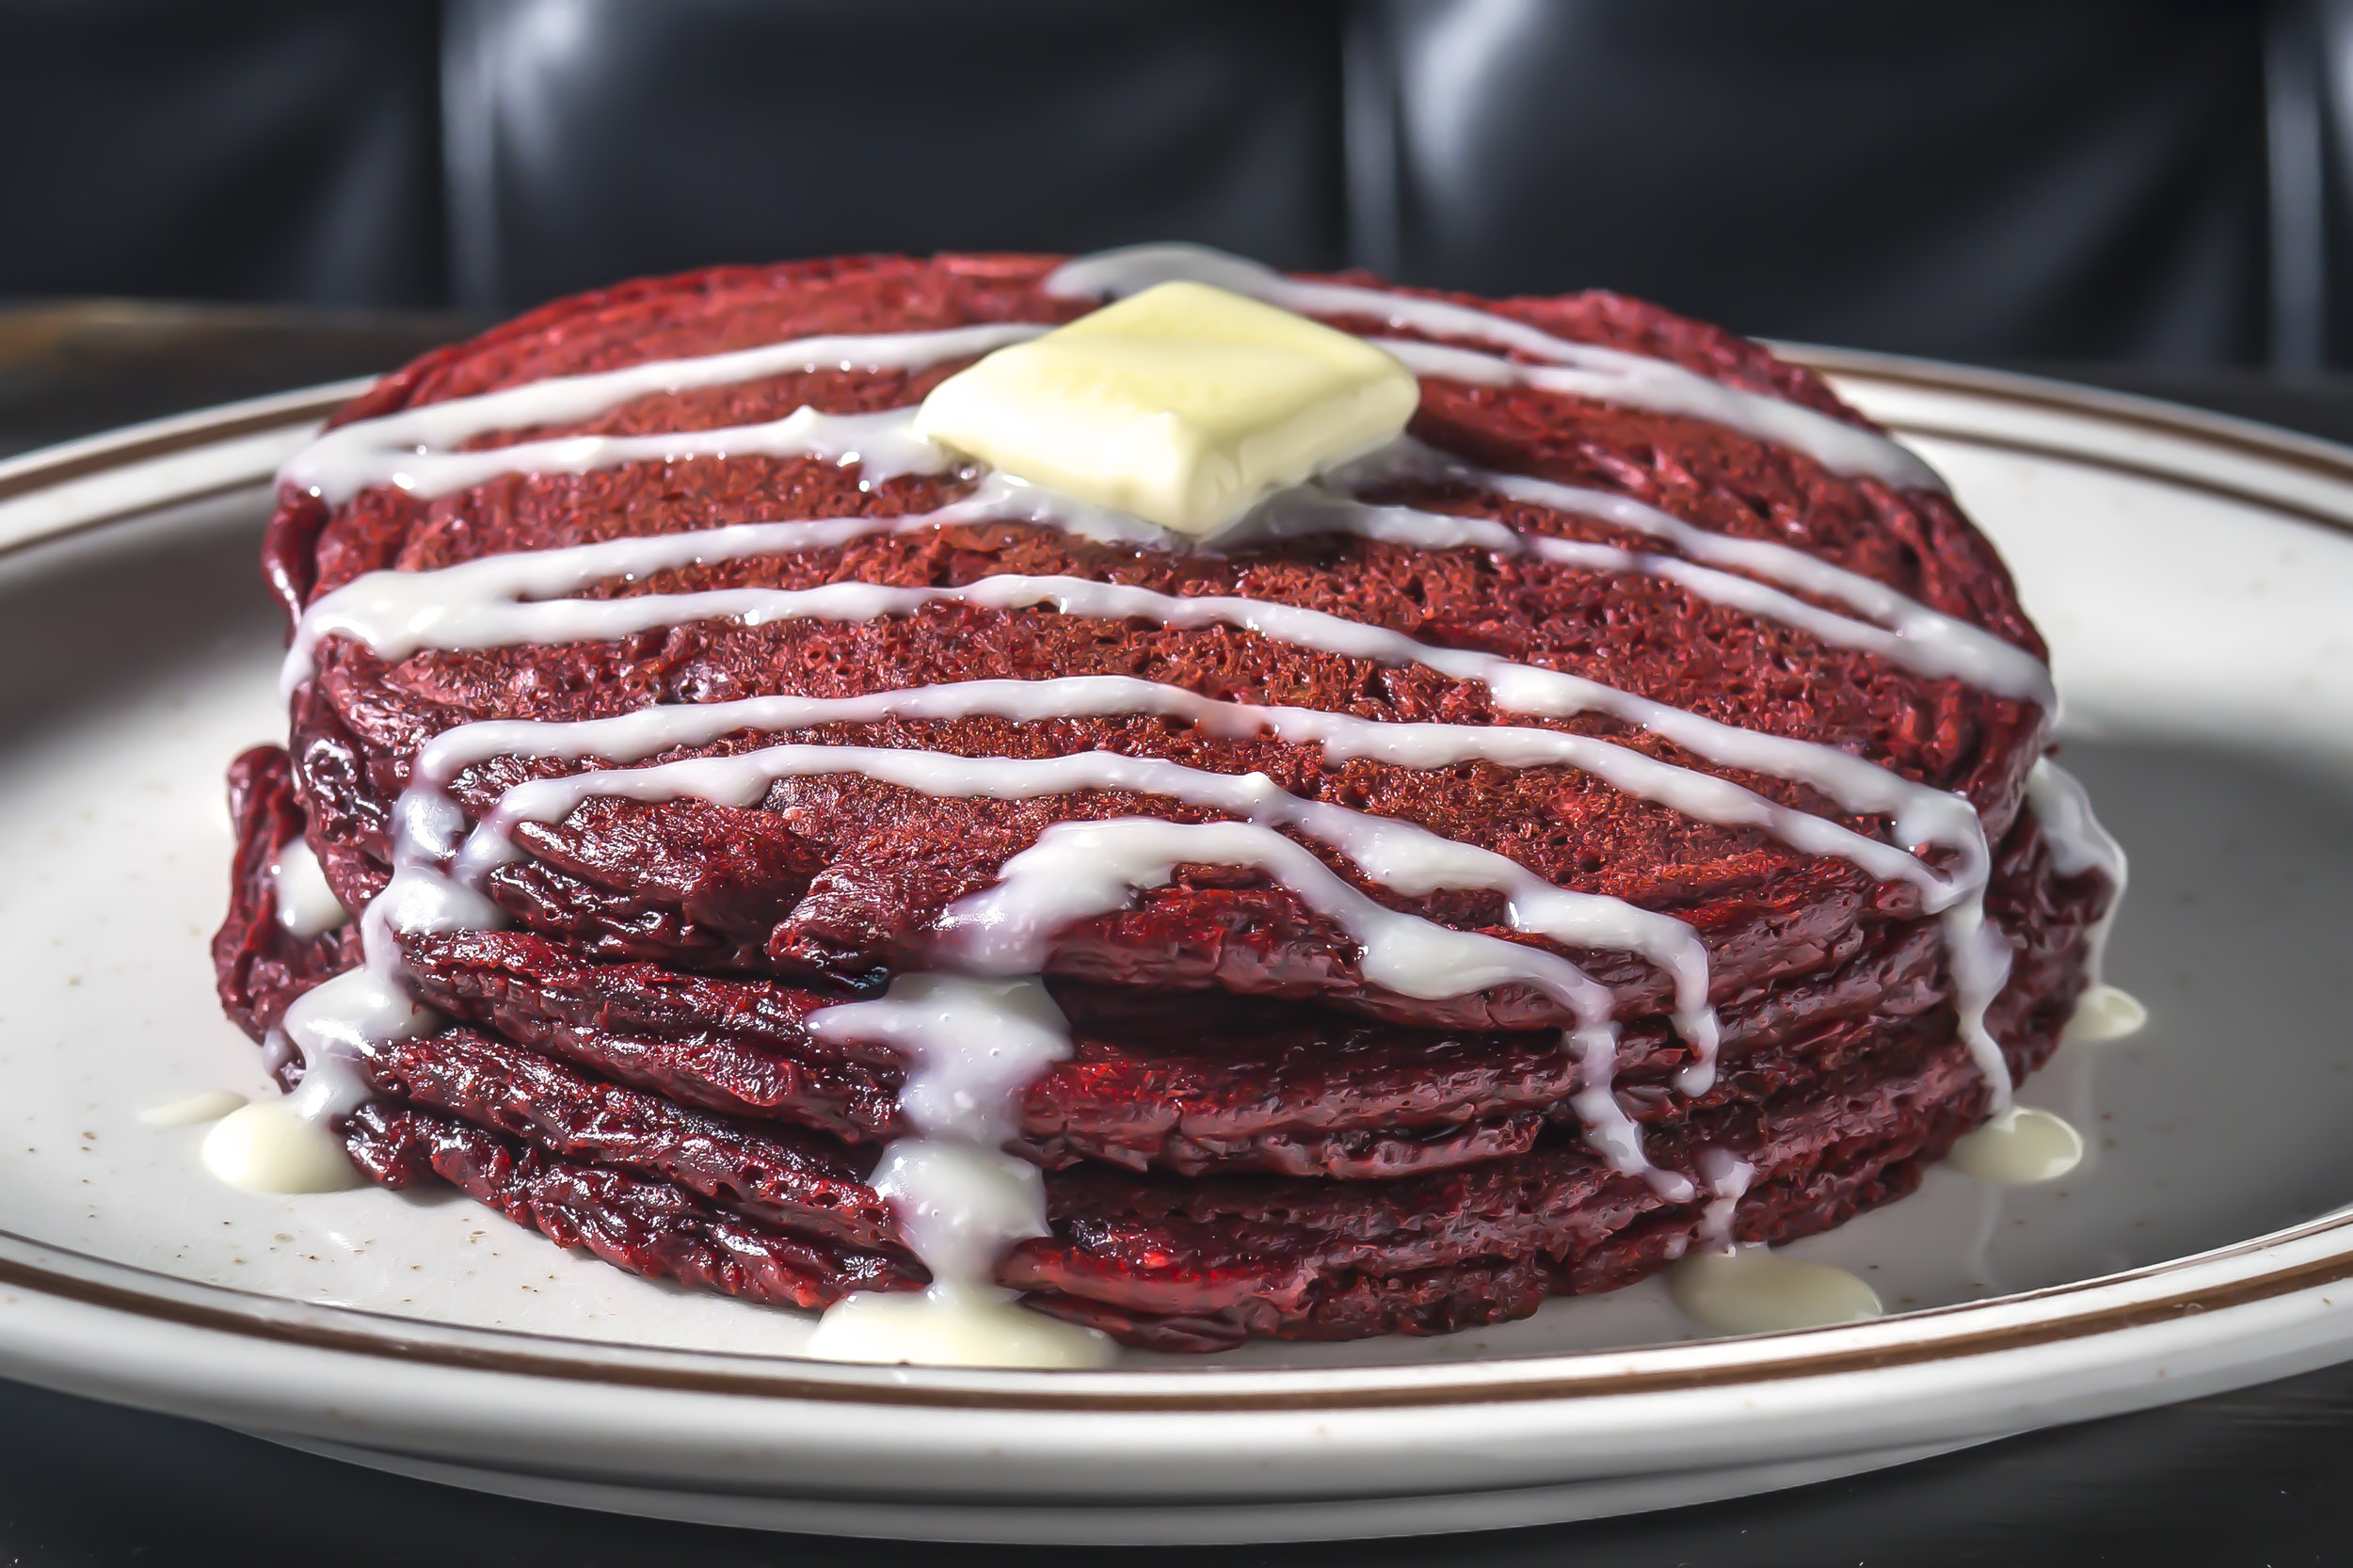 Red Velvet Pancakes, served starting Midnight. Photo credit Paul Wagtouicz.